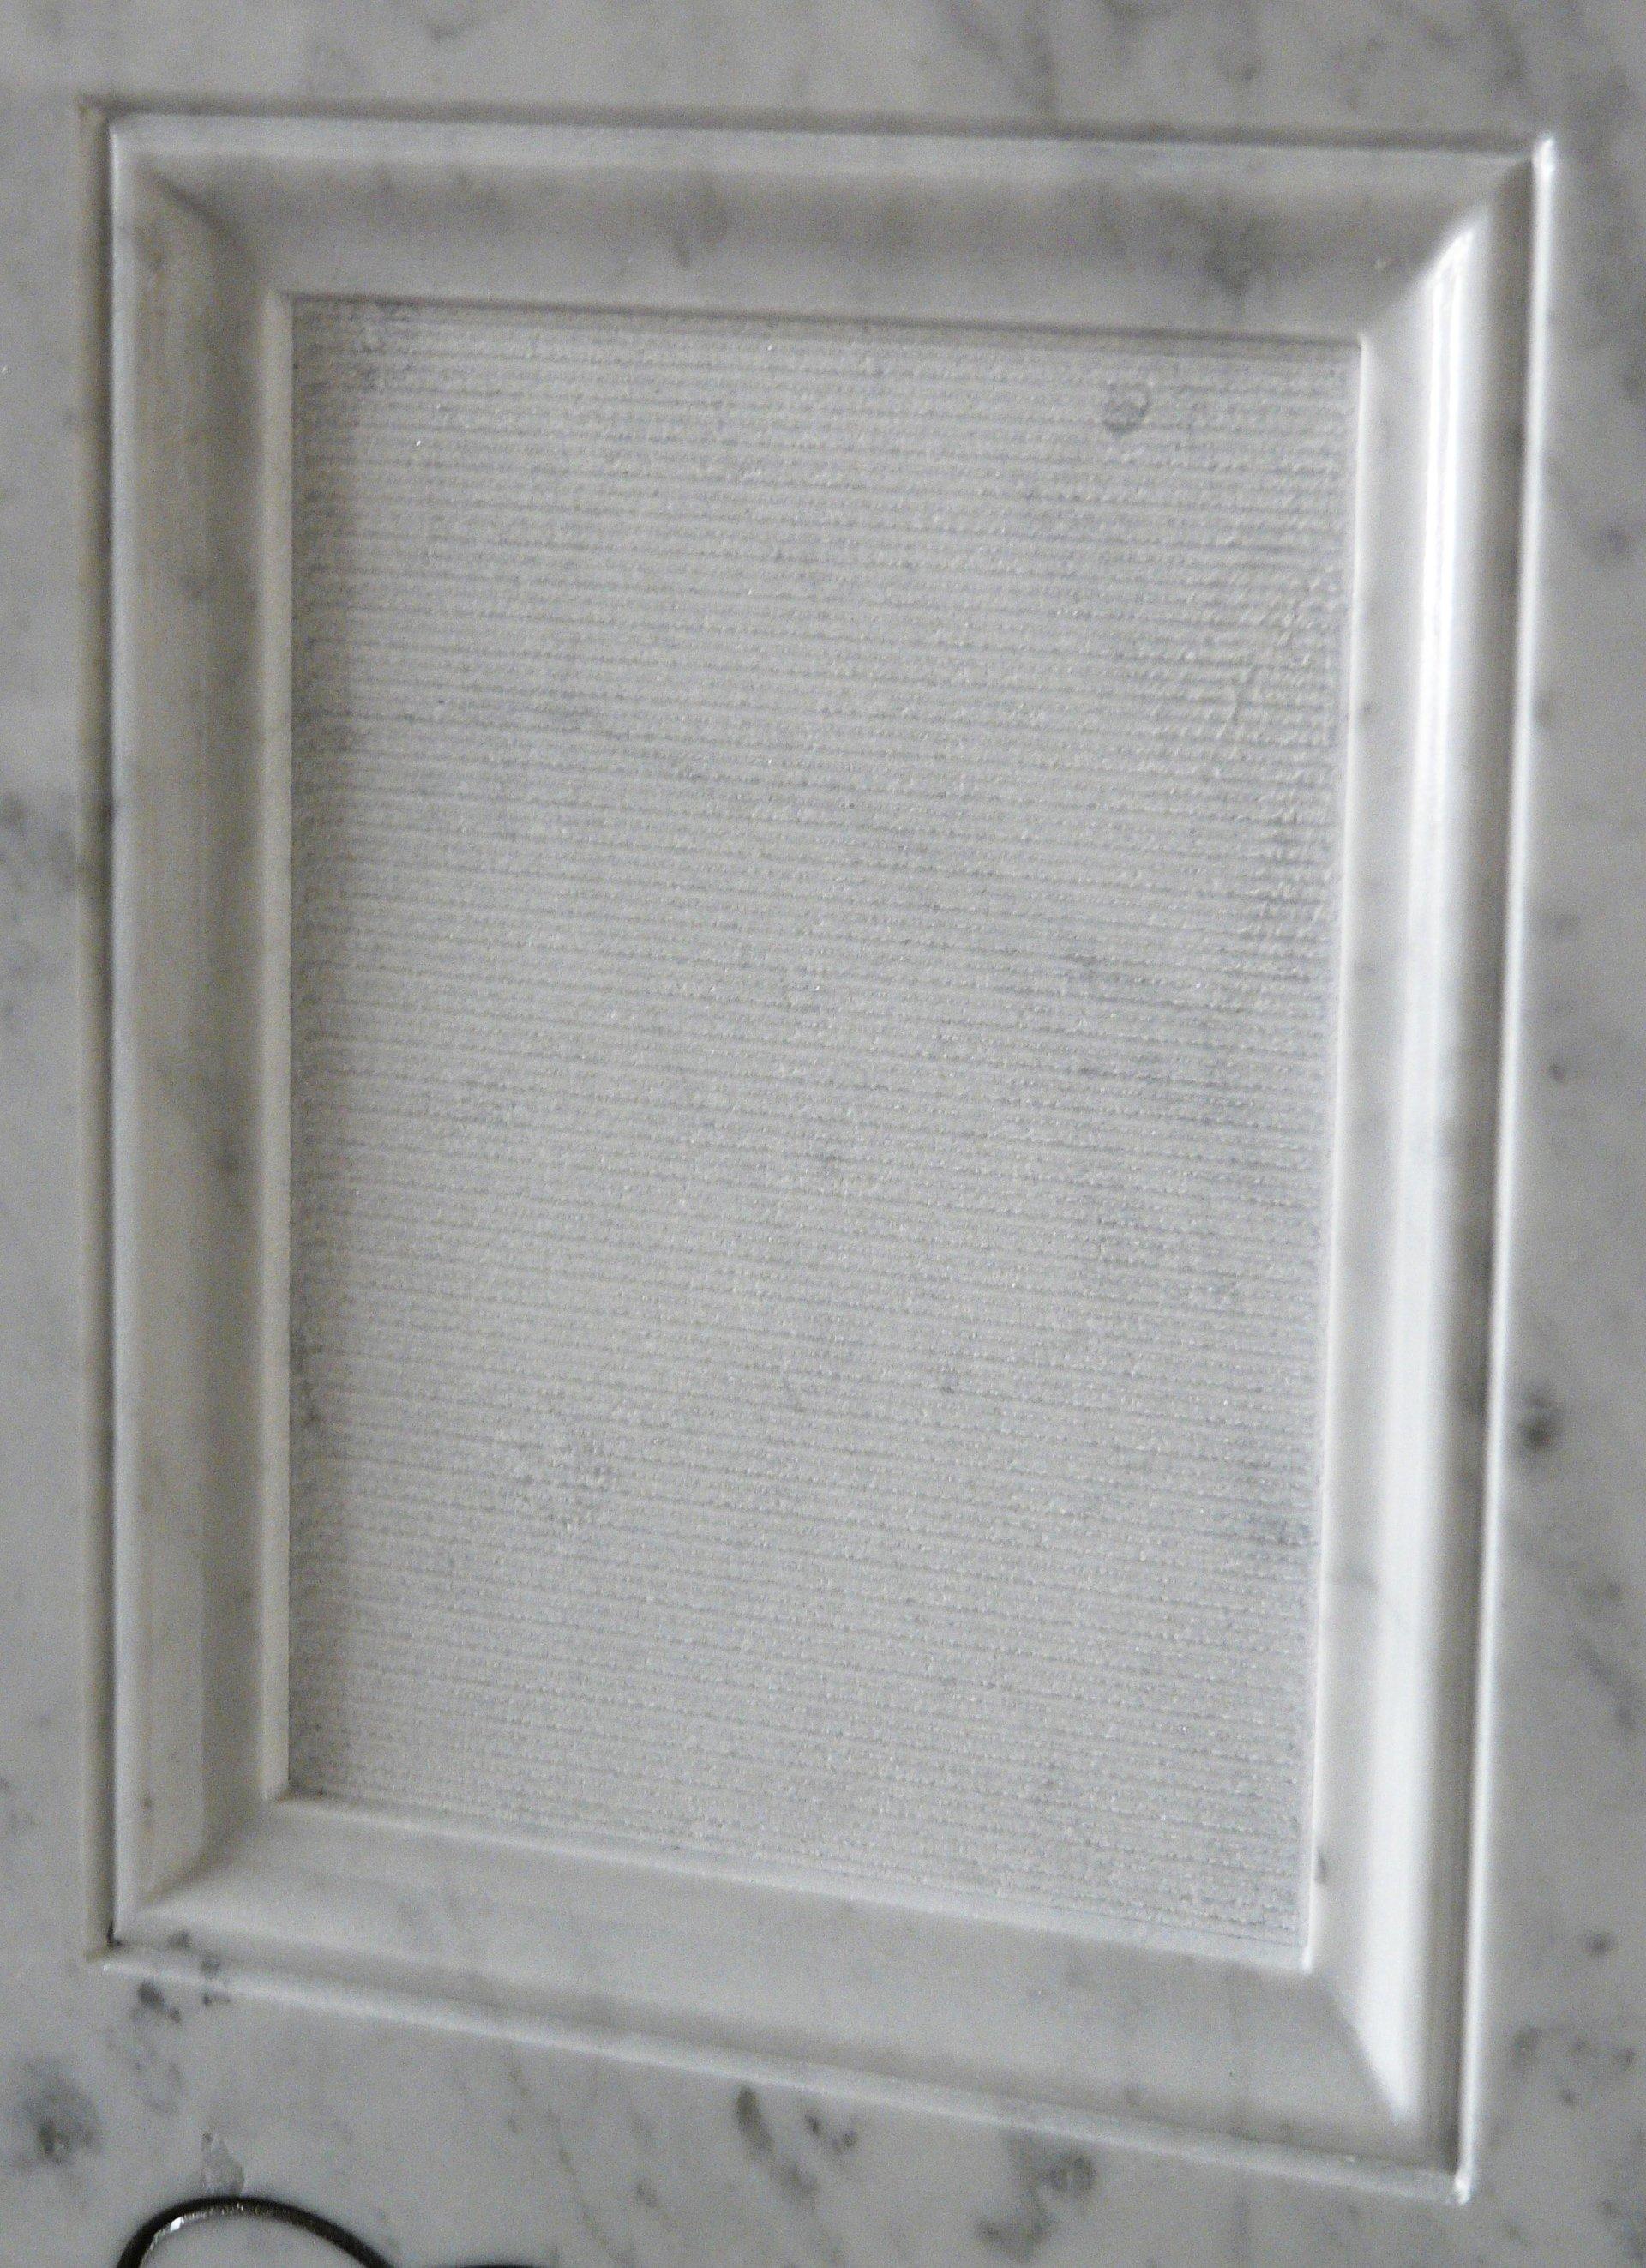 bassorilievo su marmo bianco rappresentante una cornice